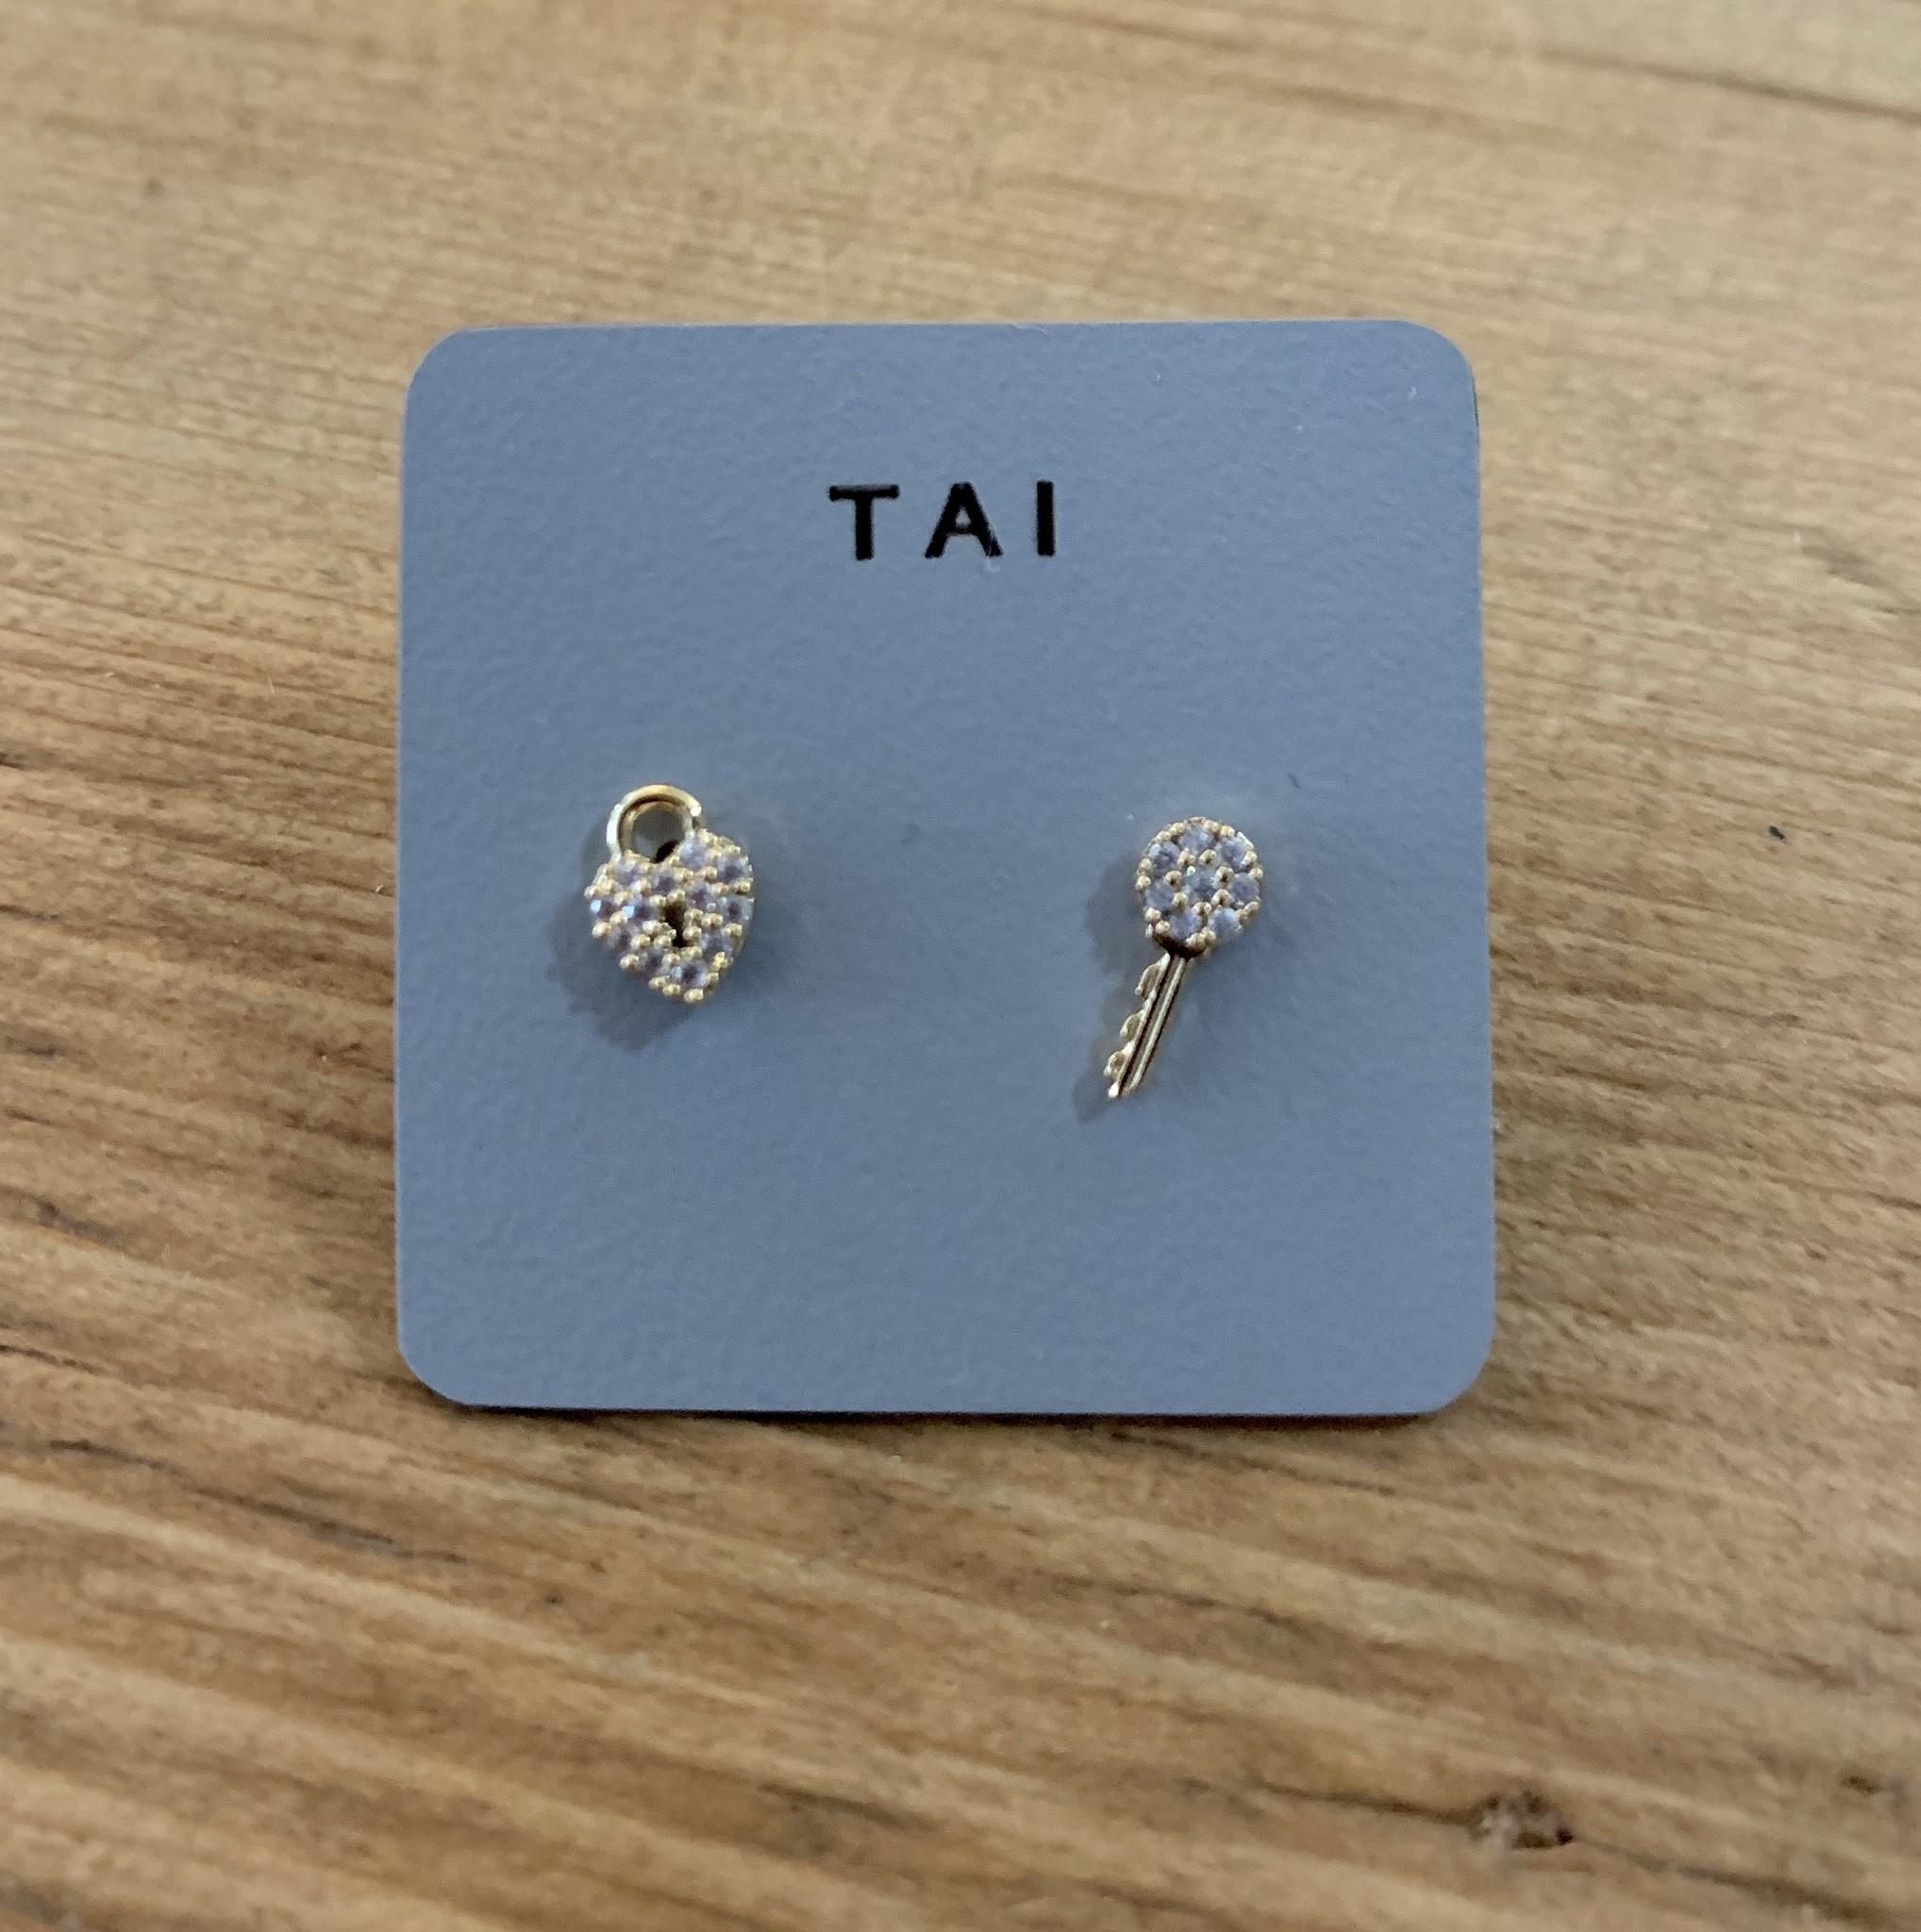 tai Mix/Match Earrings-Lock/Key